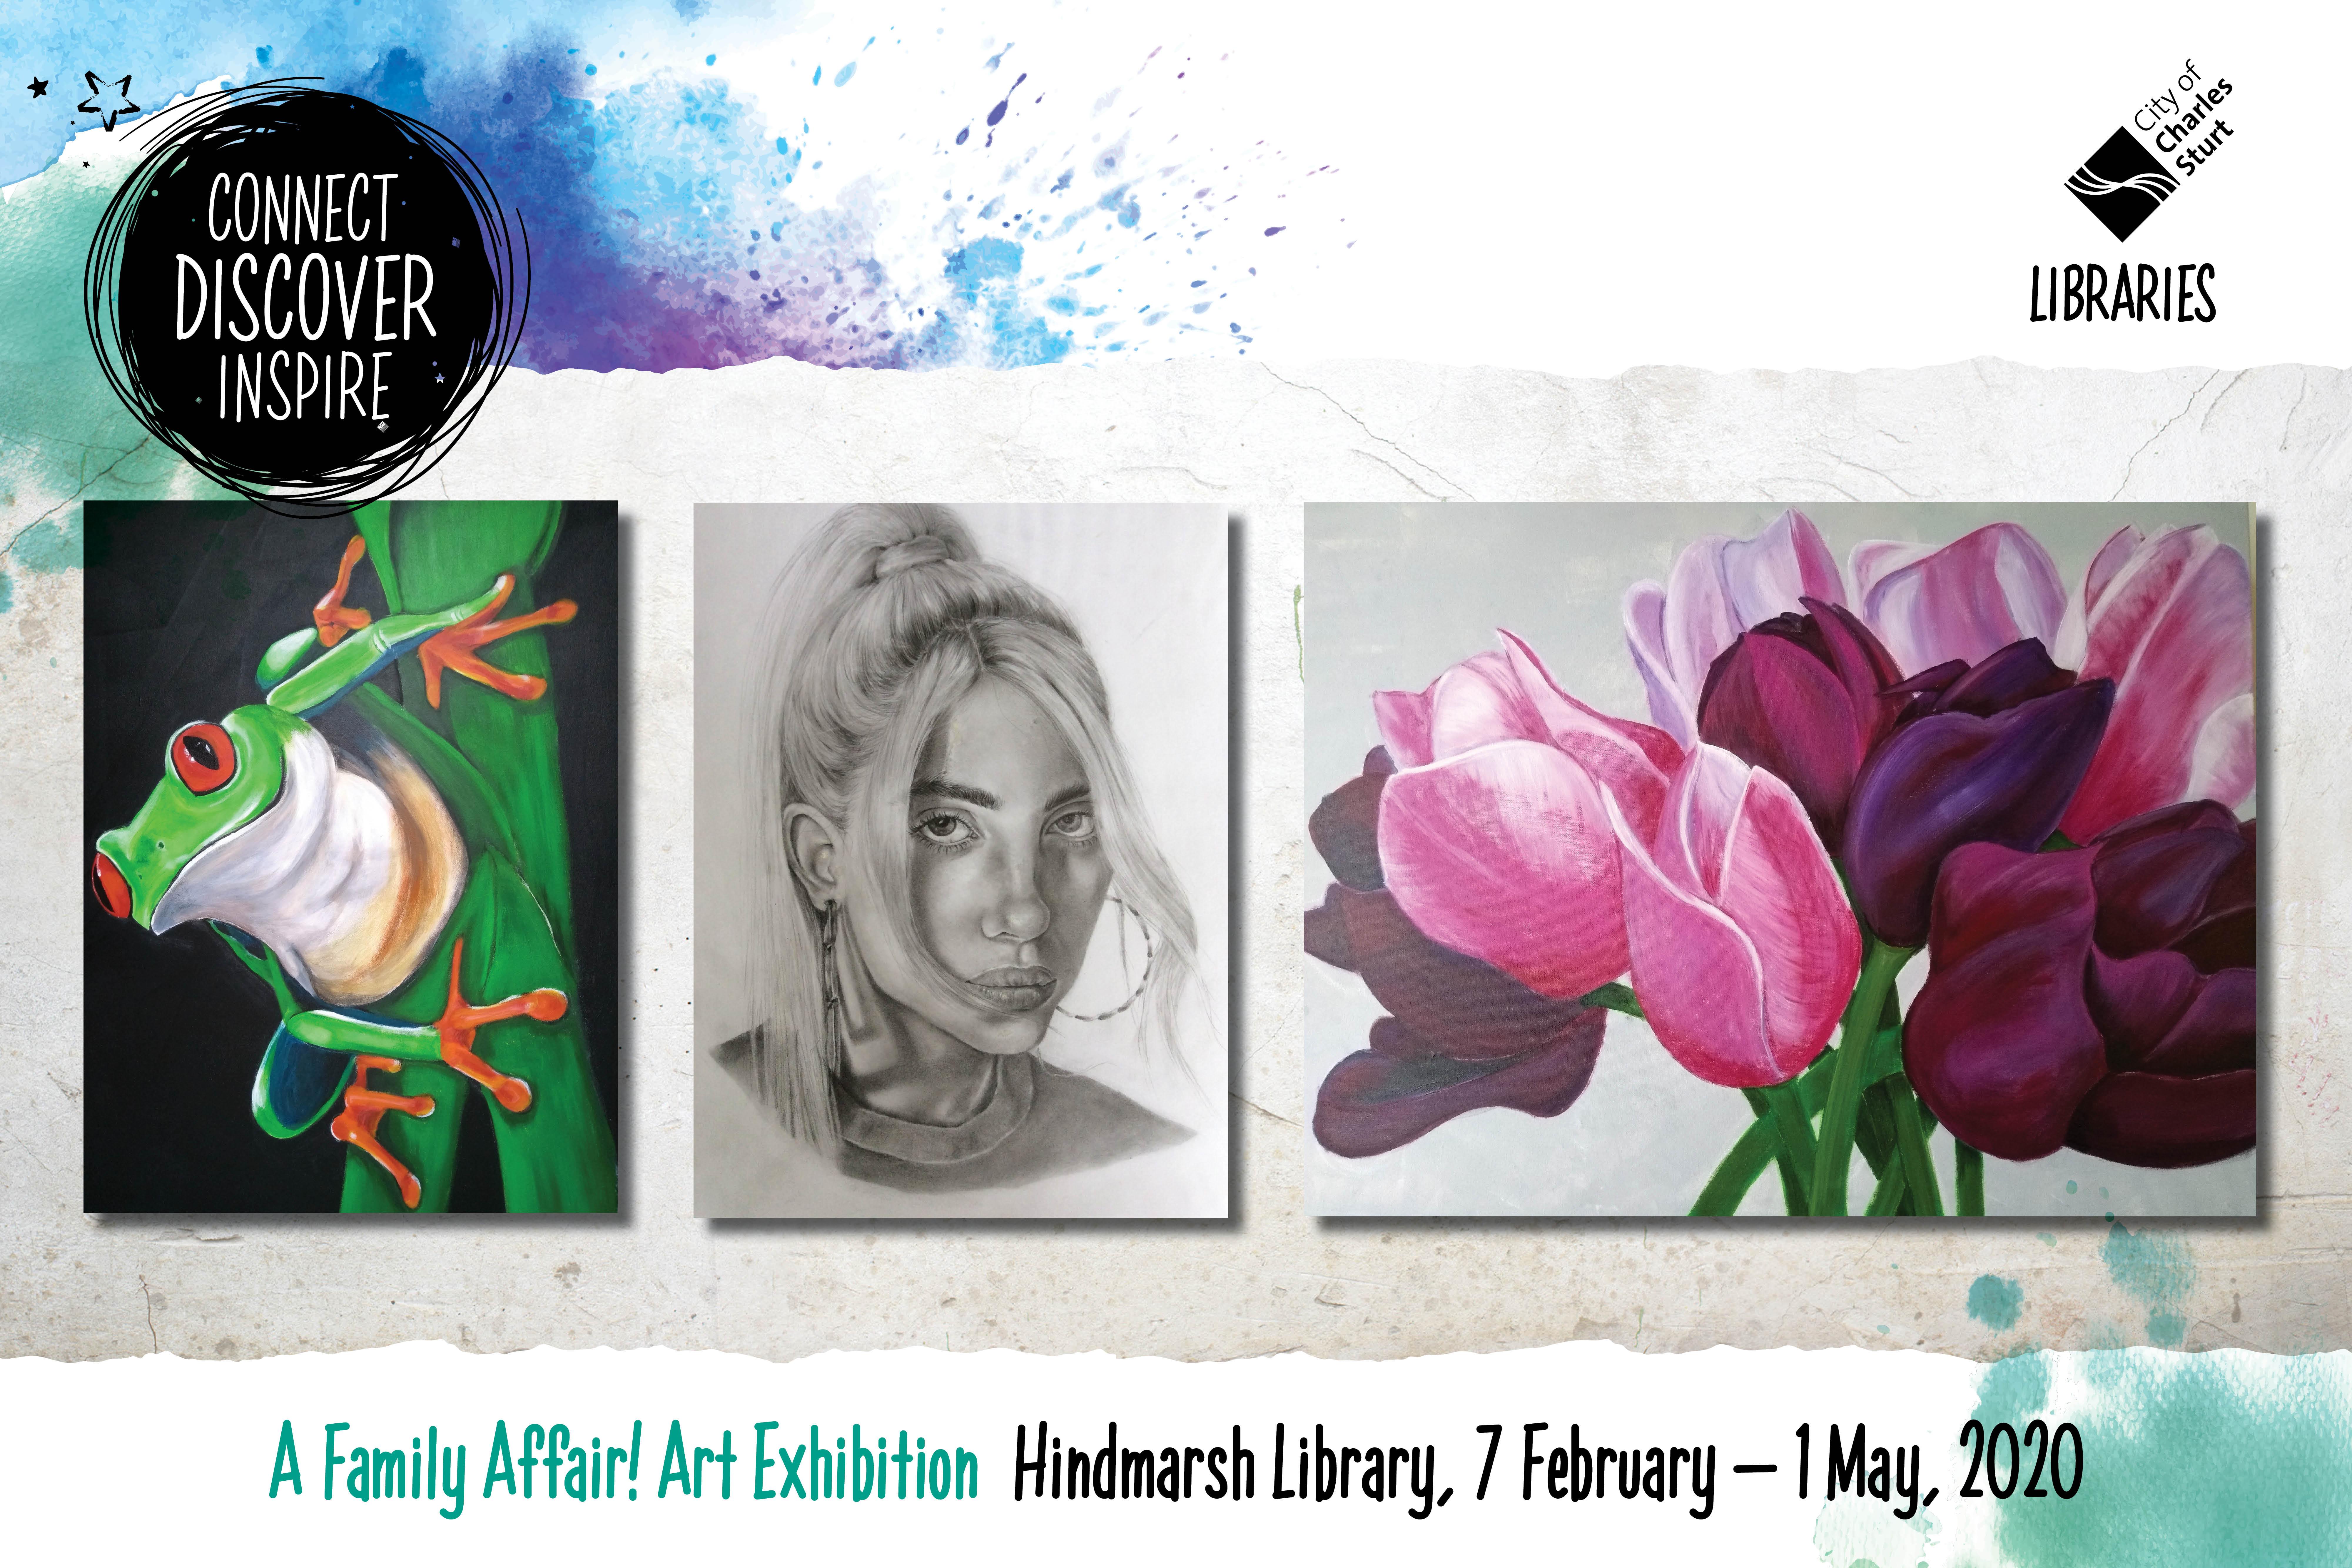 A Family Affair! Art Exhibition